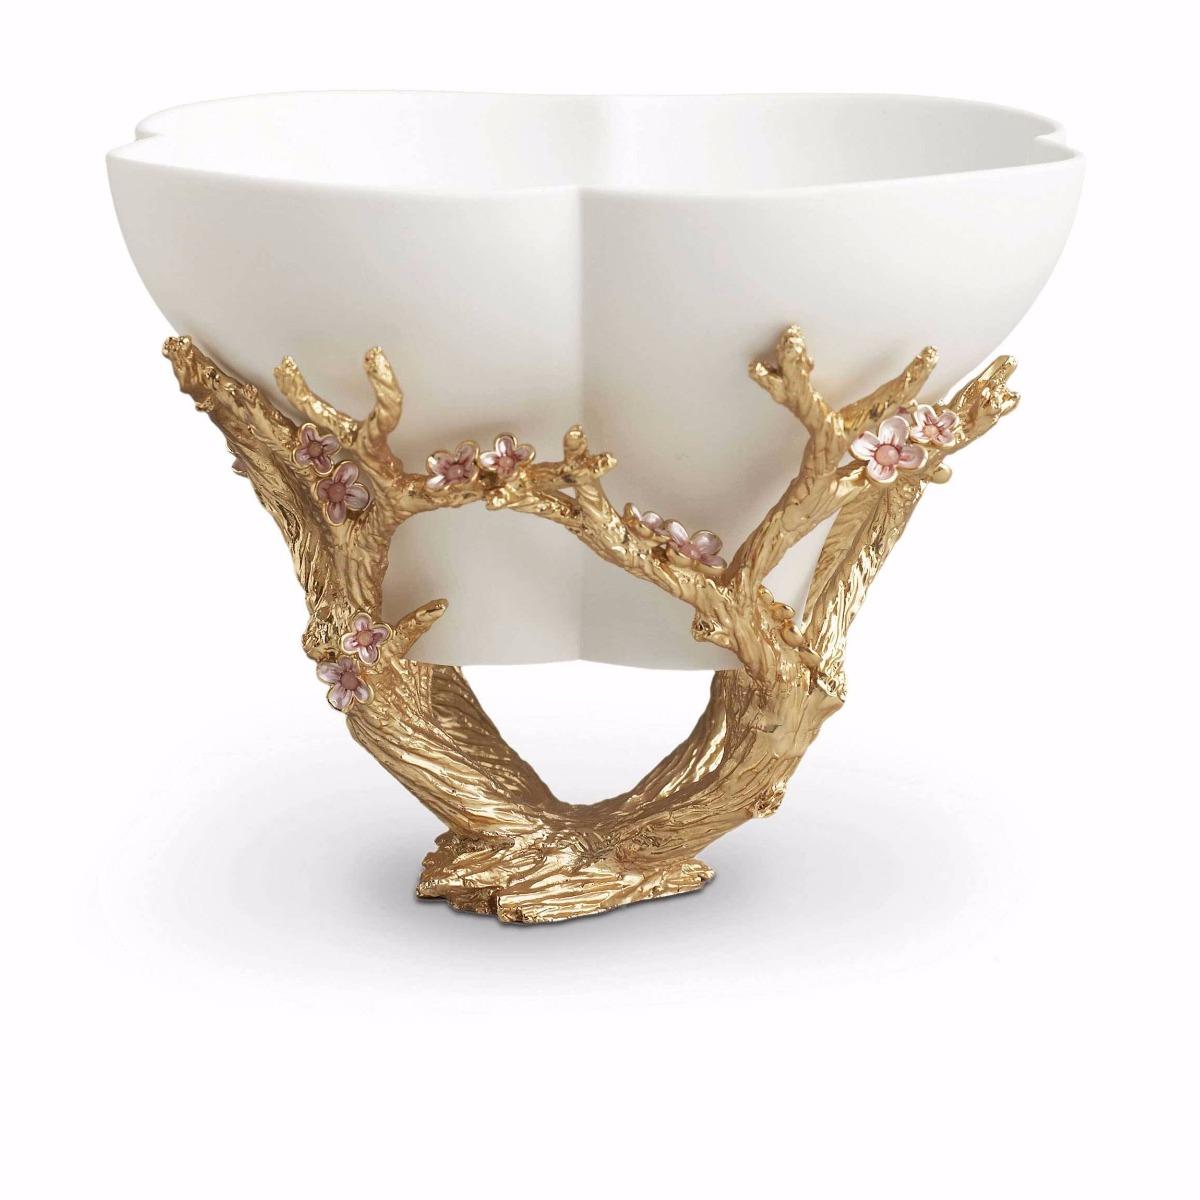 Luxury accessory Cherry bowl handmade in London Workshop by Luxuria London